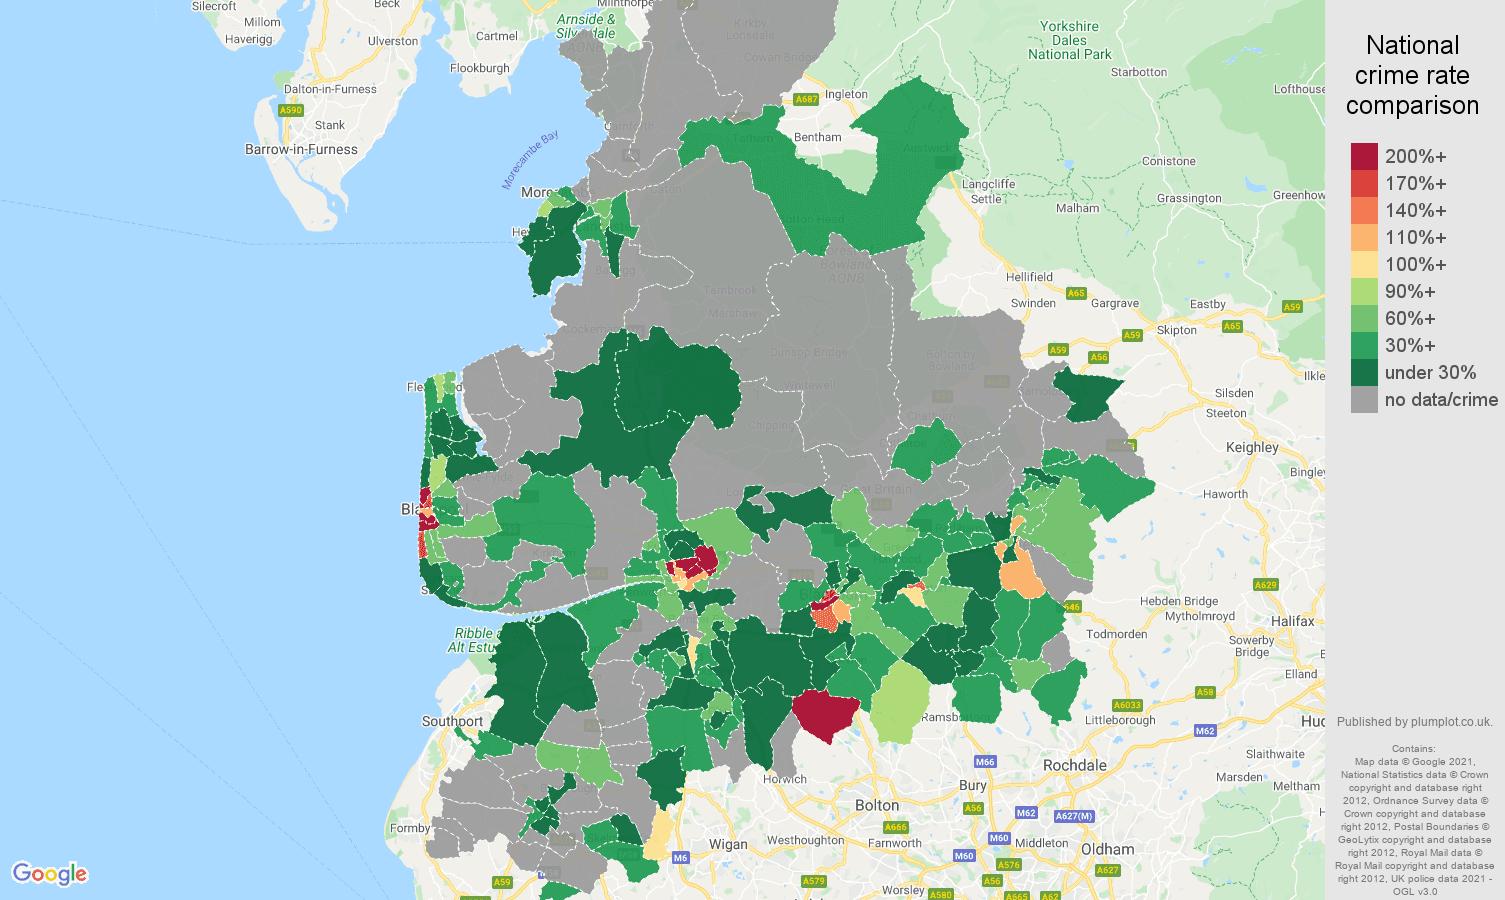 Lancashire robbery crime rate comparison map